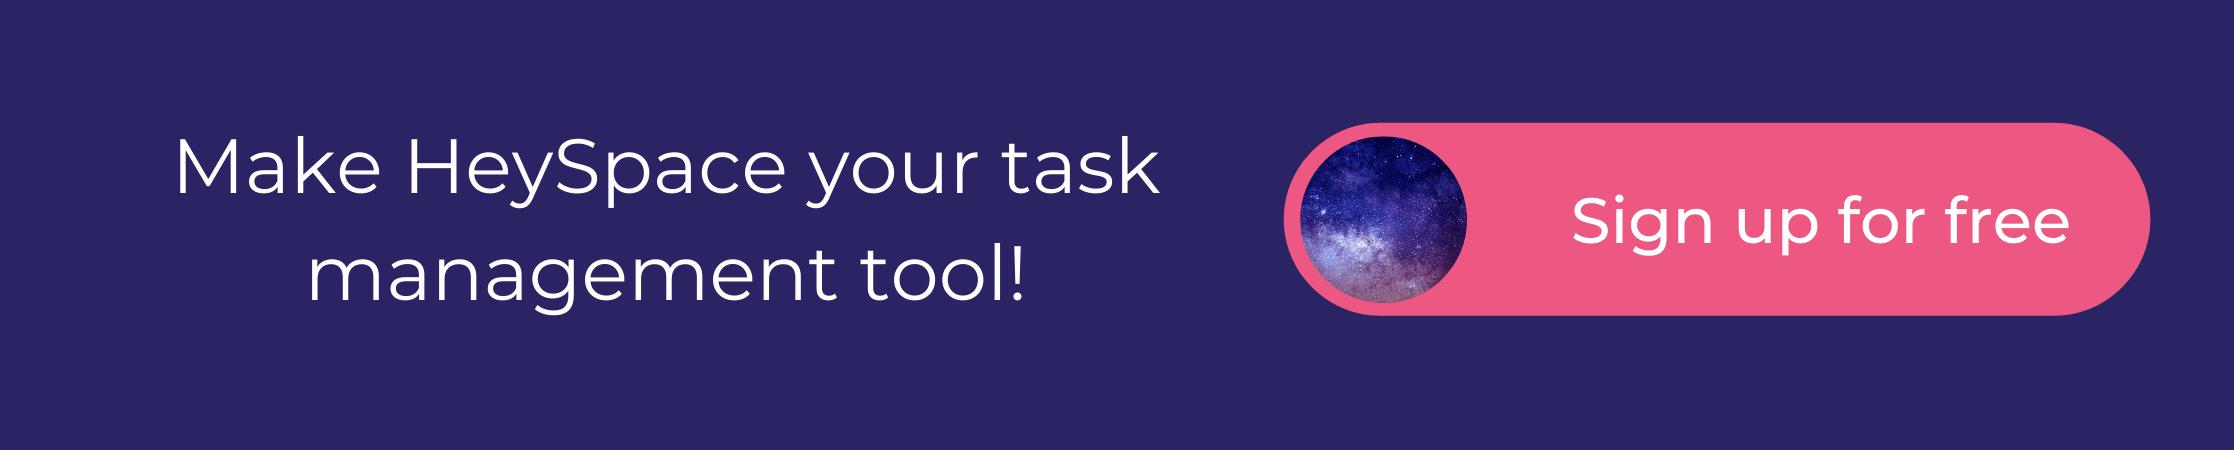 HeySpace task management tool